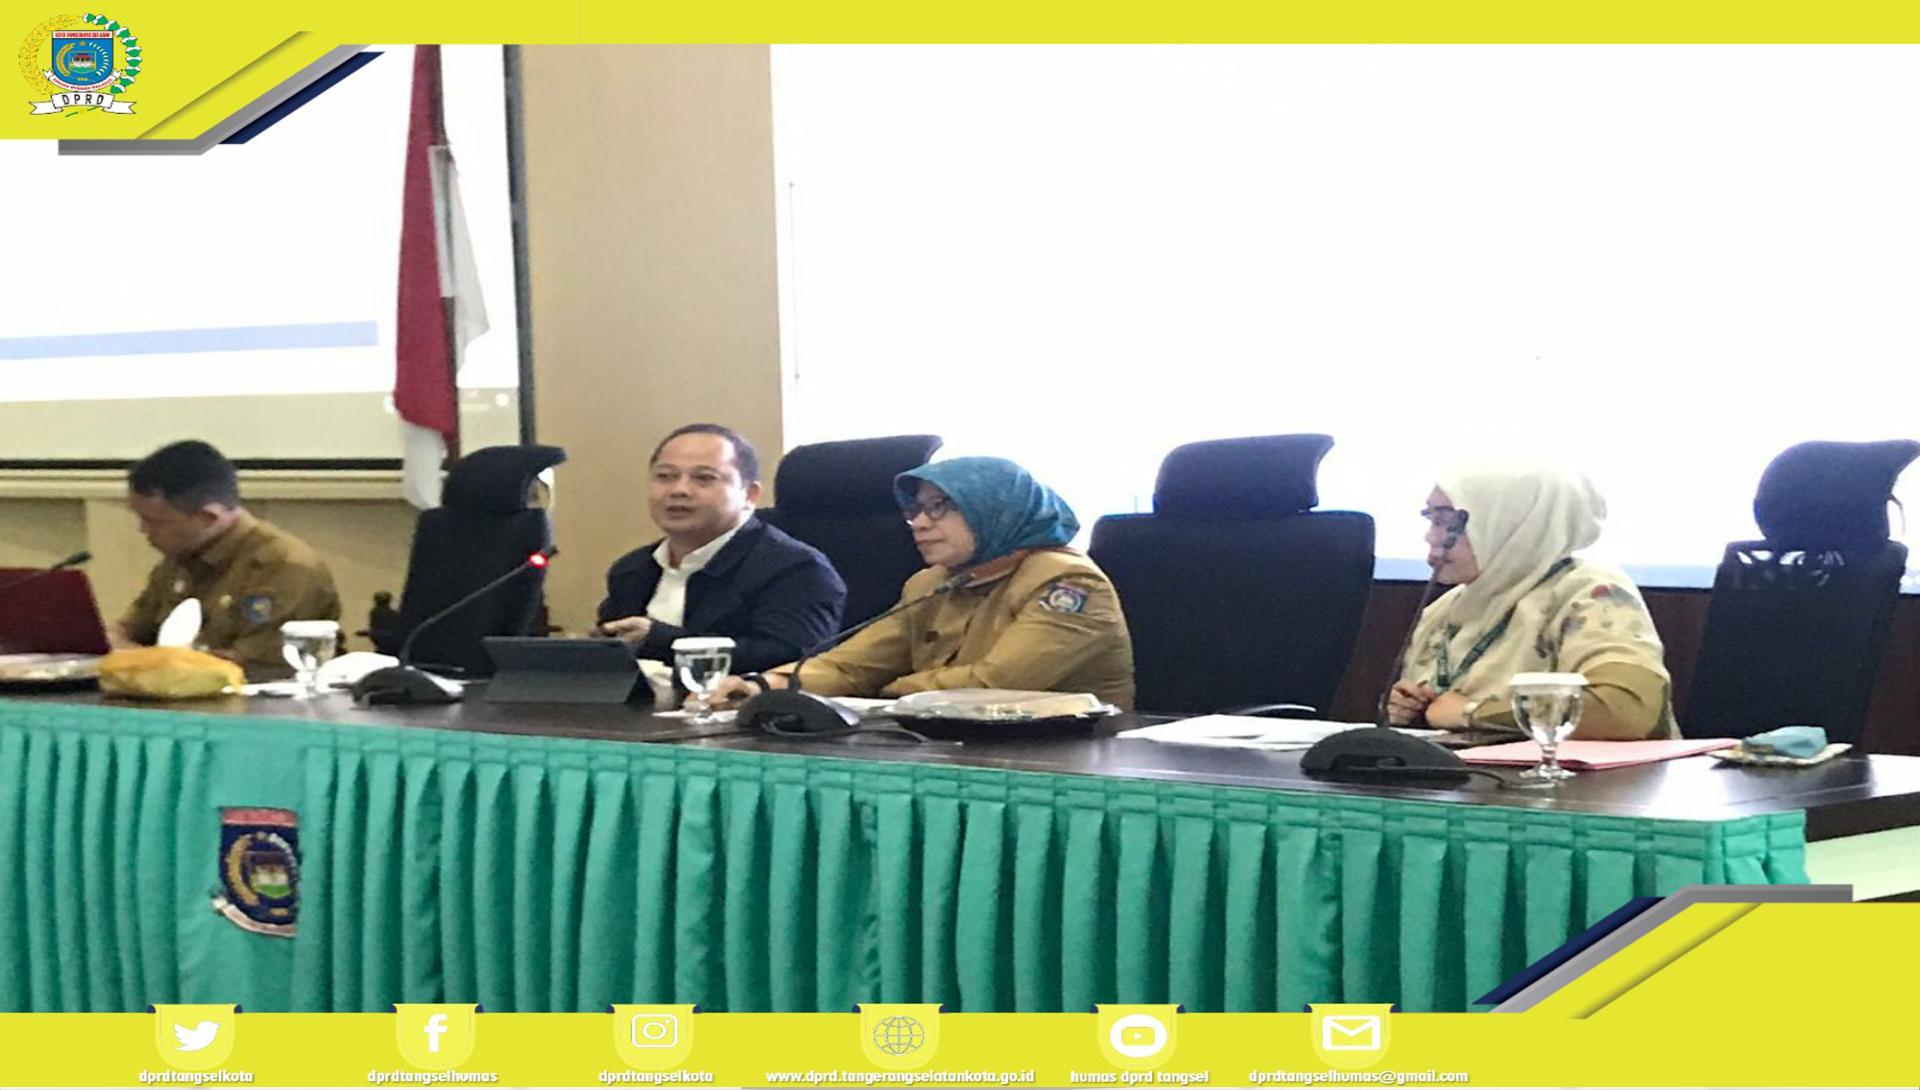 Ketua DPRD Kota Tangsel menjadi Narasumber pada Kegiatan DPMP3AKB